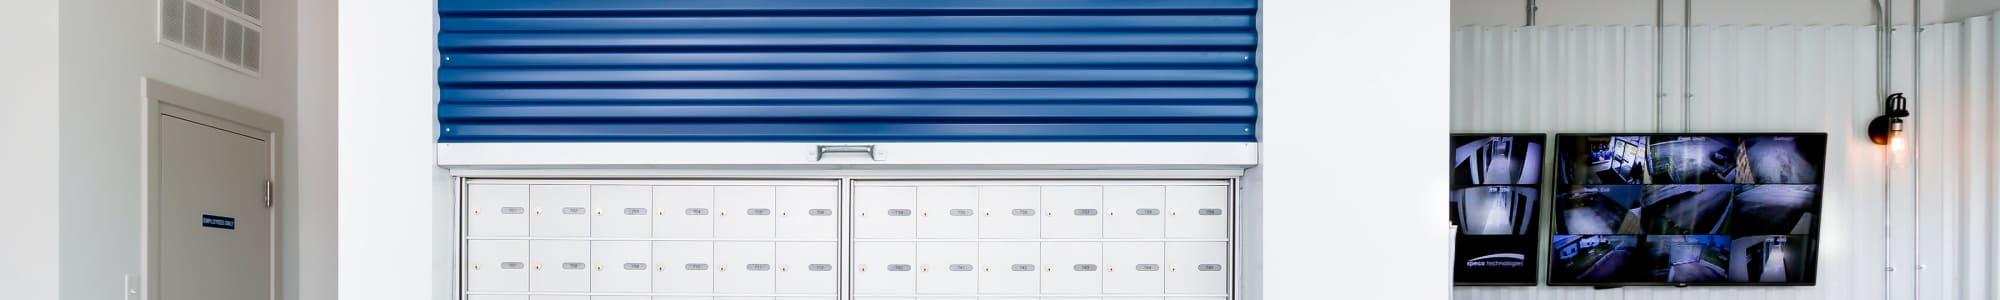 Mailboxes at CityBox Storage in Calgary, Alberta